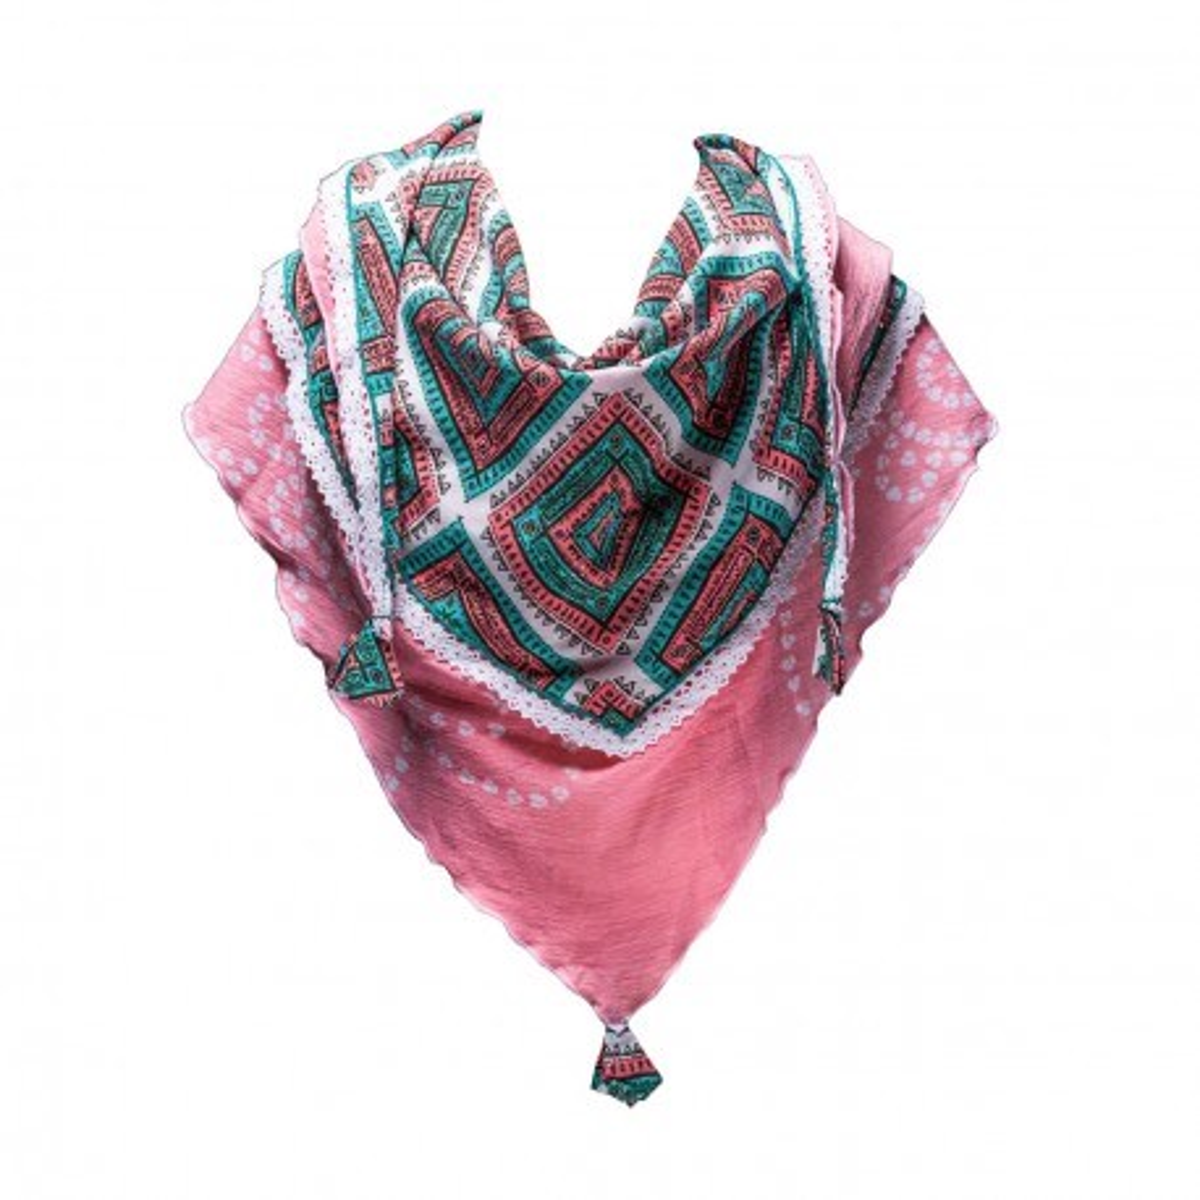 Foulard triangle fille coton rose et vert